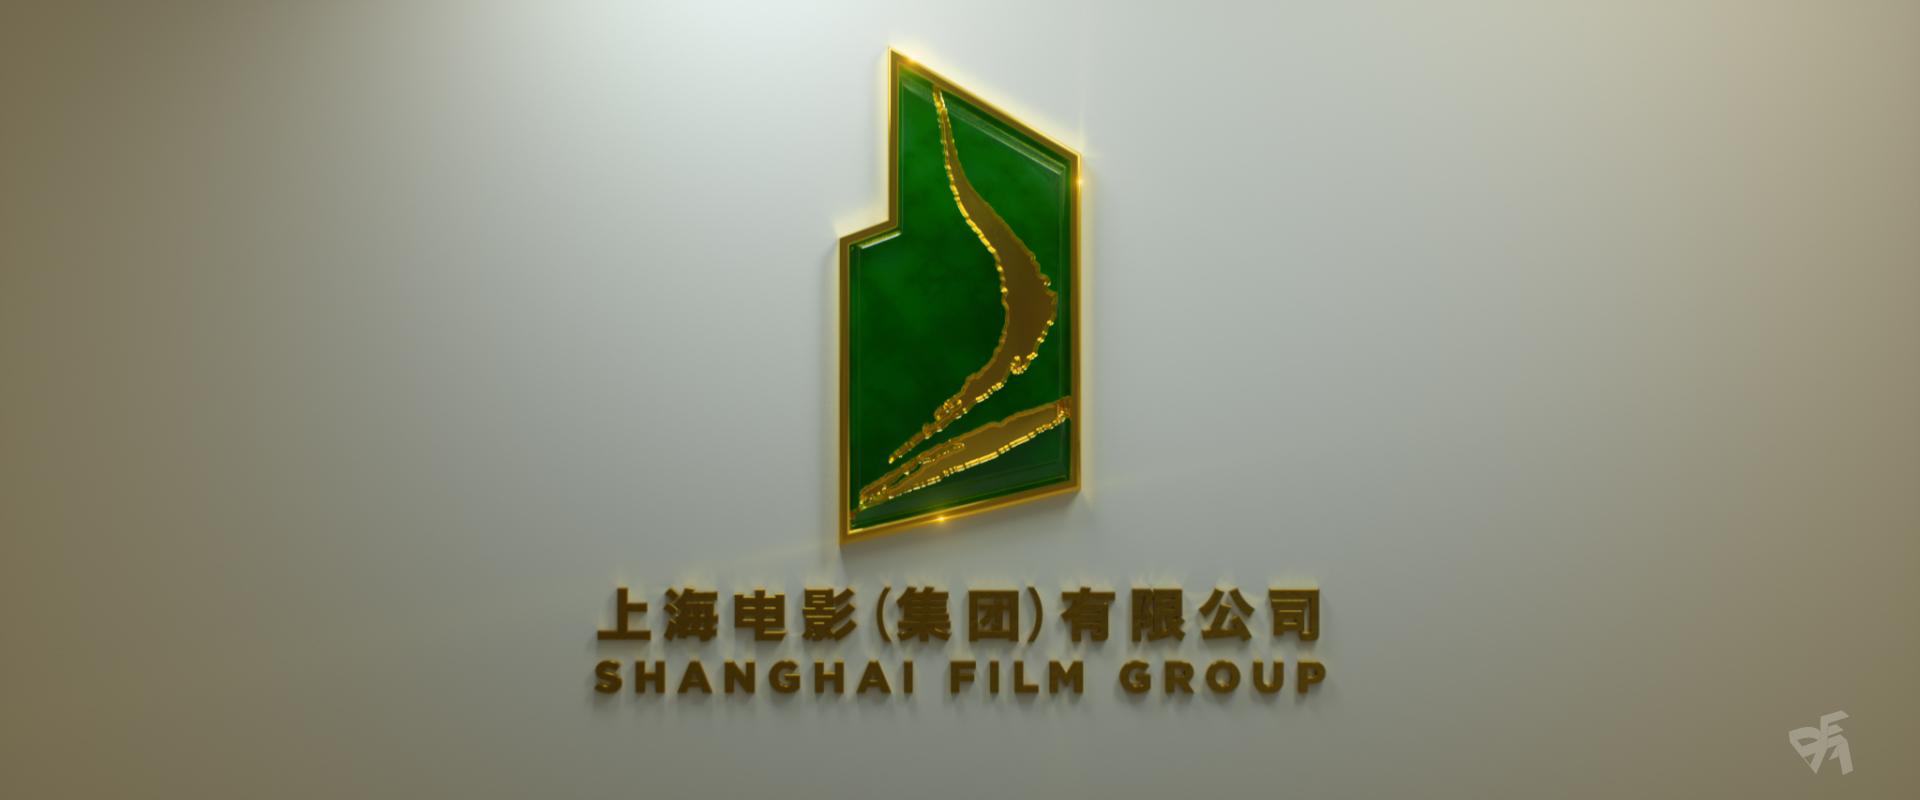 ShanghaiFilmGroup_STYLEFRAME_03.jpg